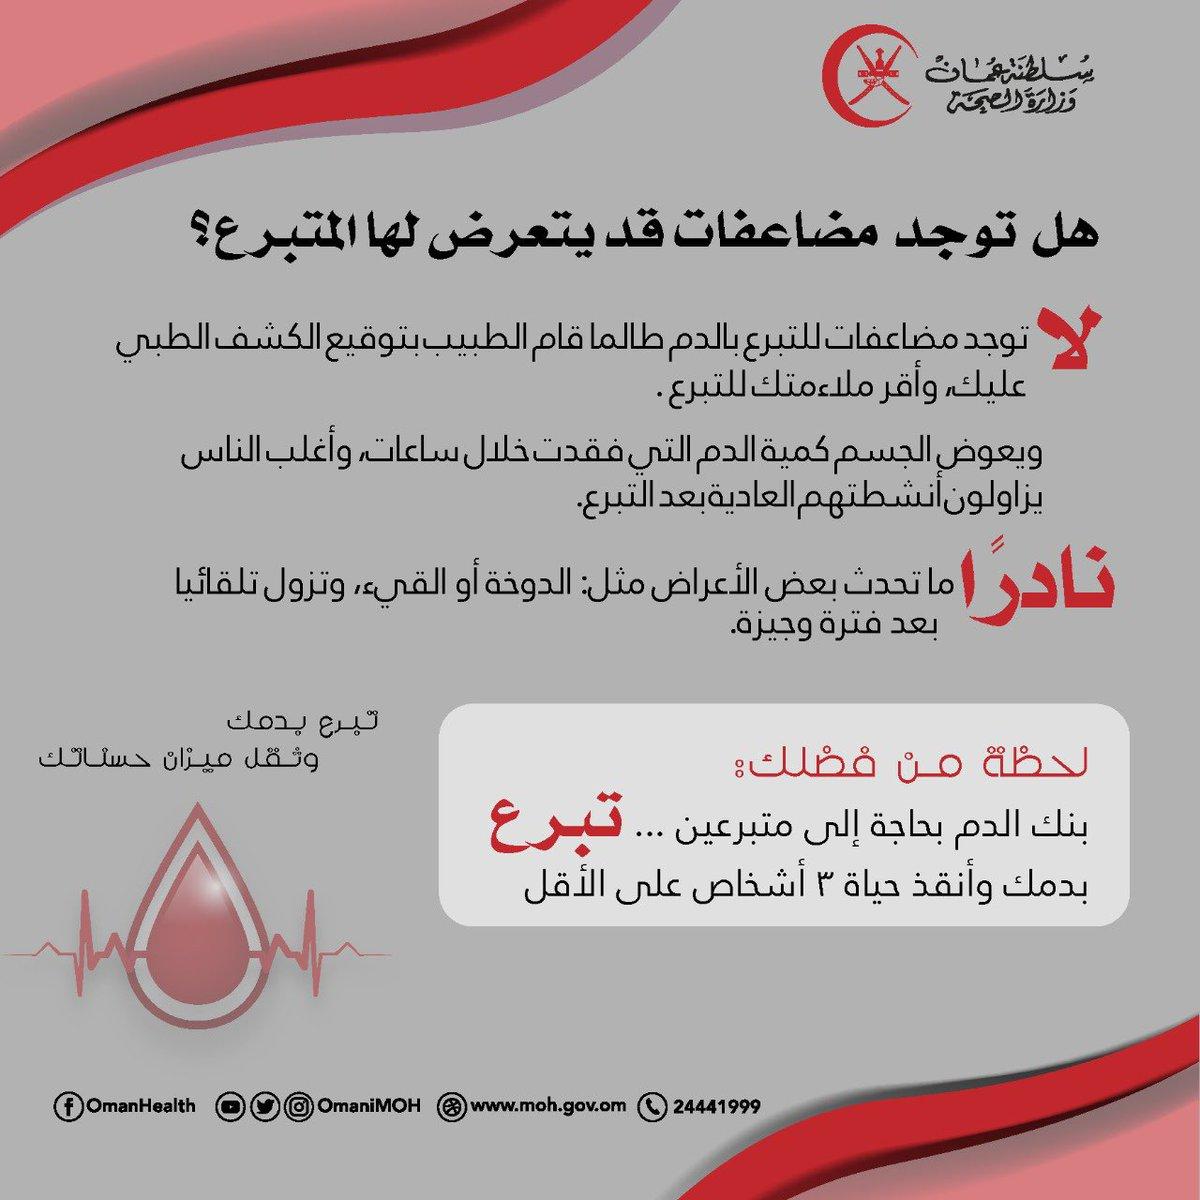 دائرة خدمات بنوك الدم (@DbbsOman) Twitter Profile • sTweetly